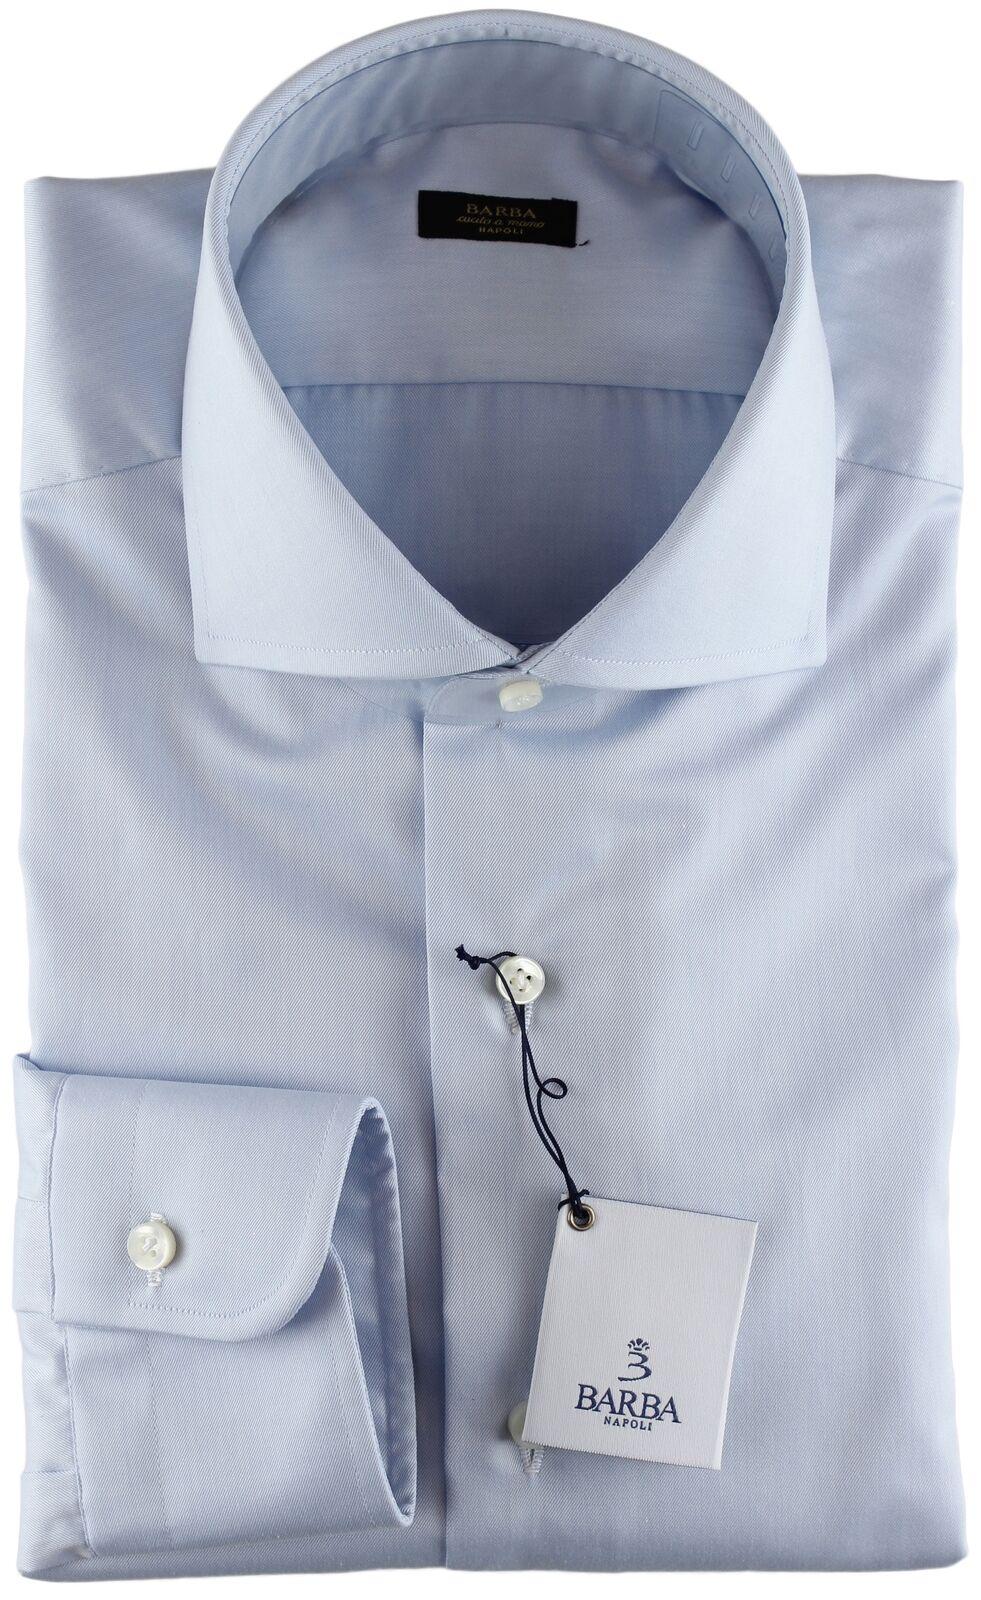 NWT BARBA NAPOLI DRESS SHIRT gold label sky bluee twill handmade 43 17